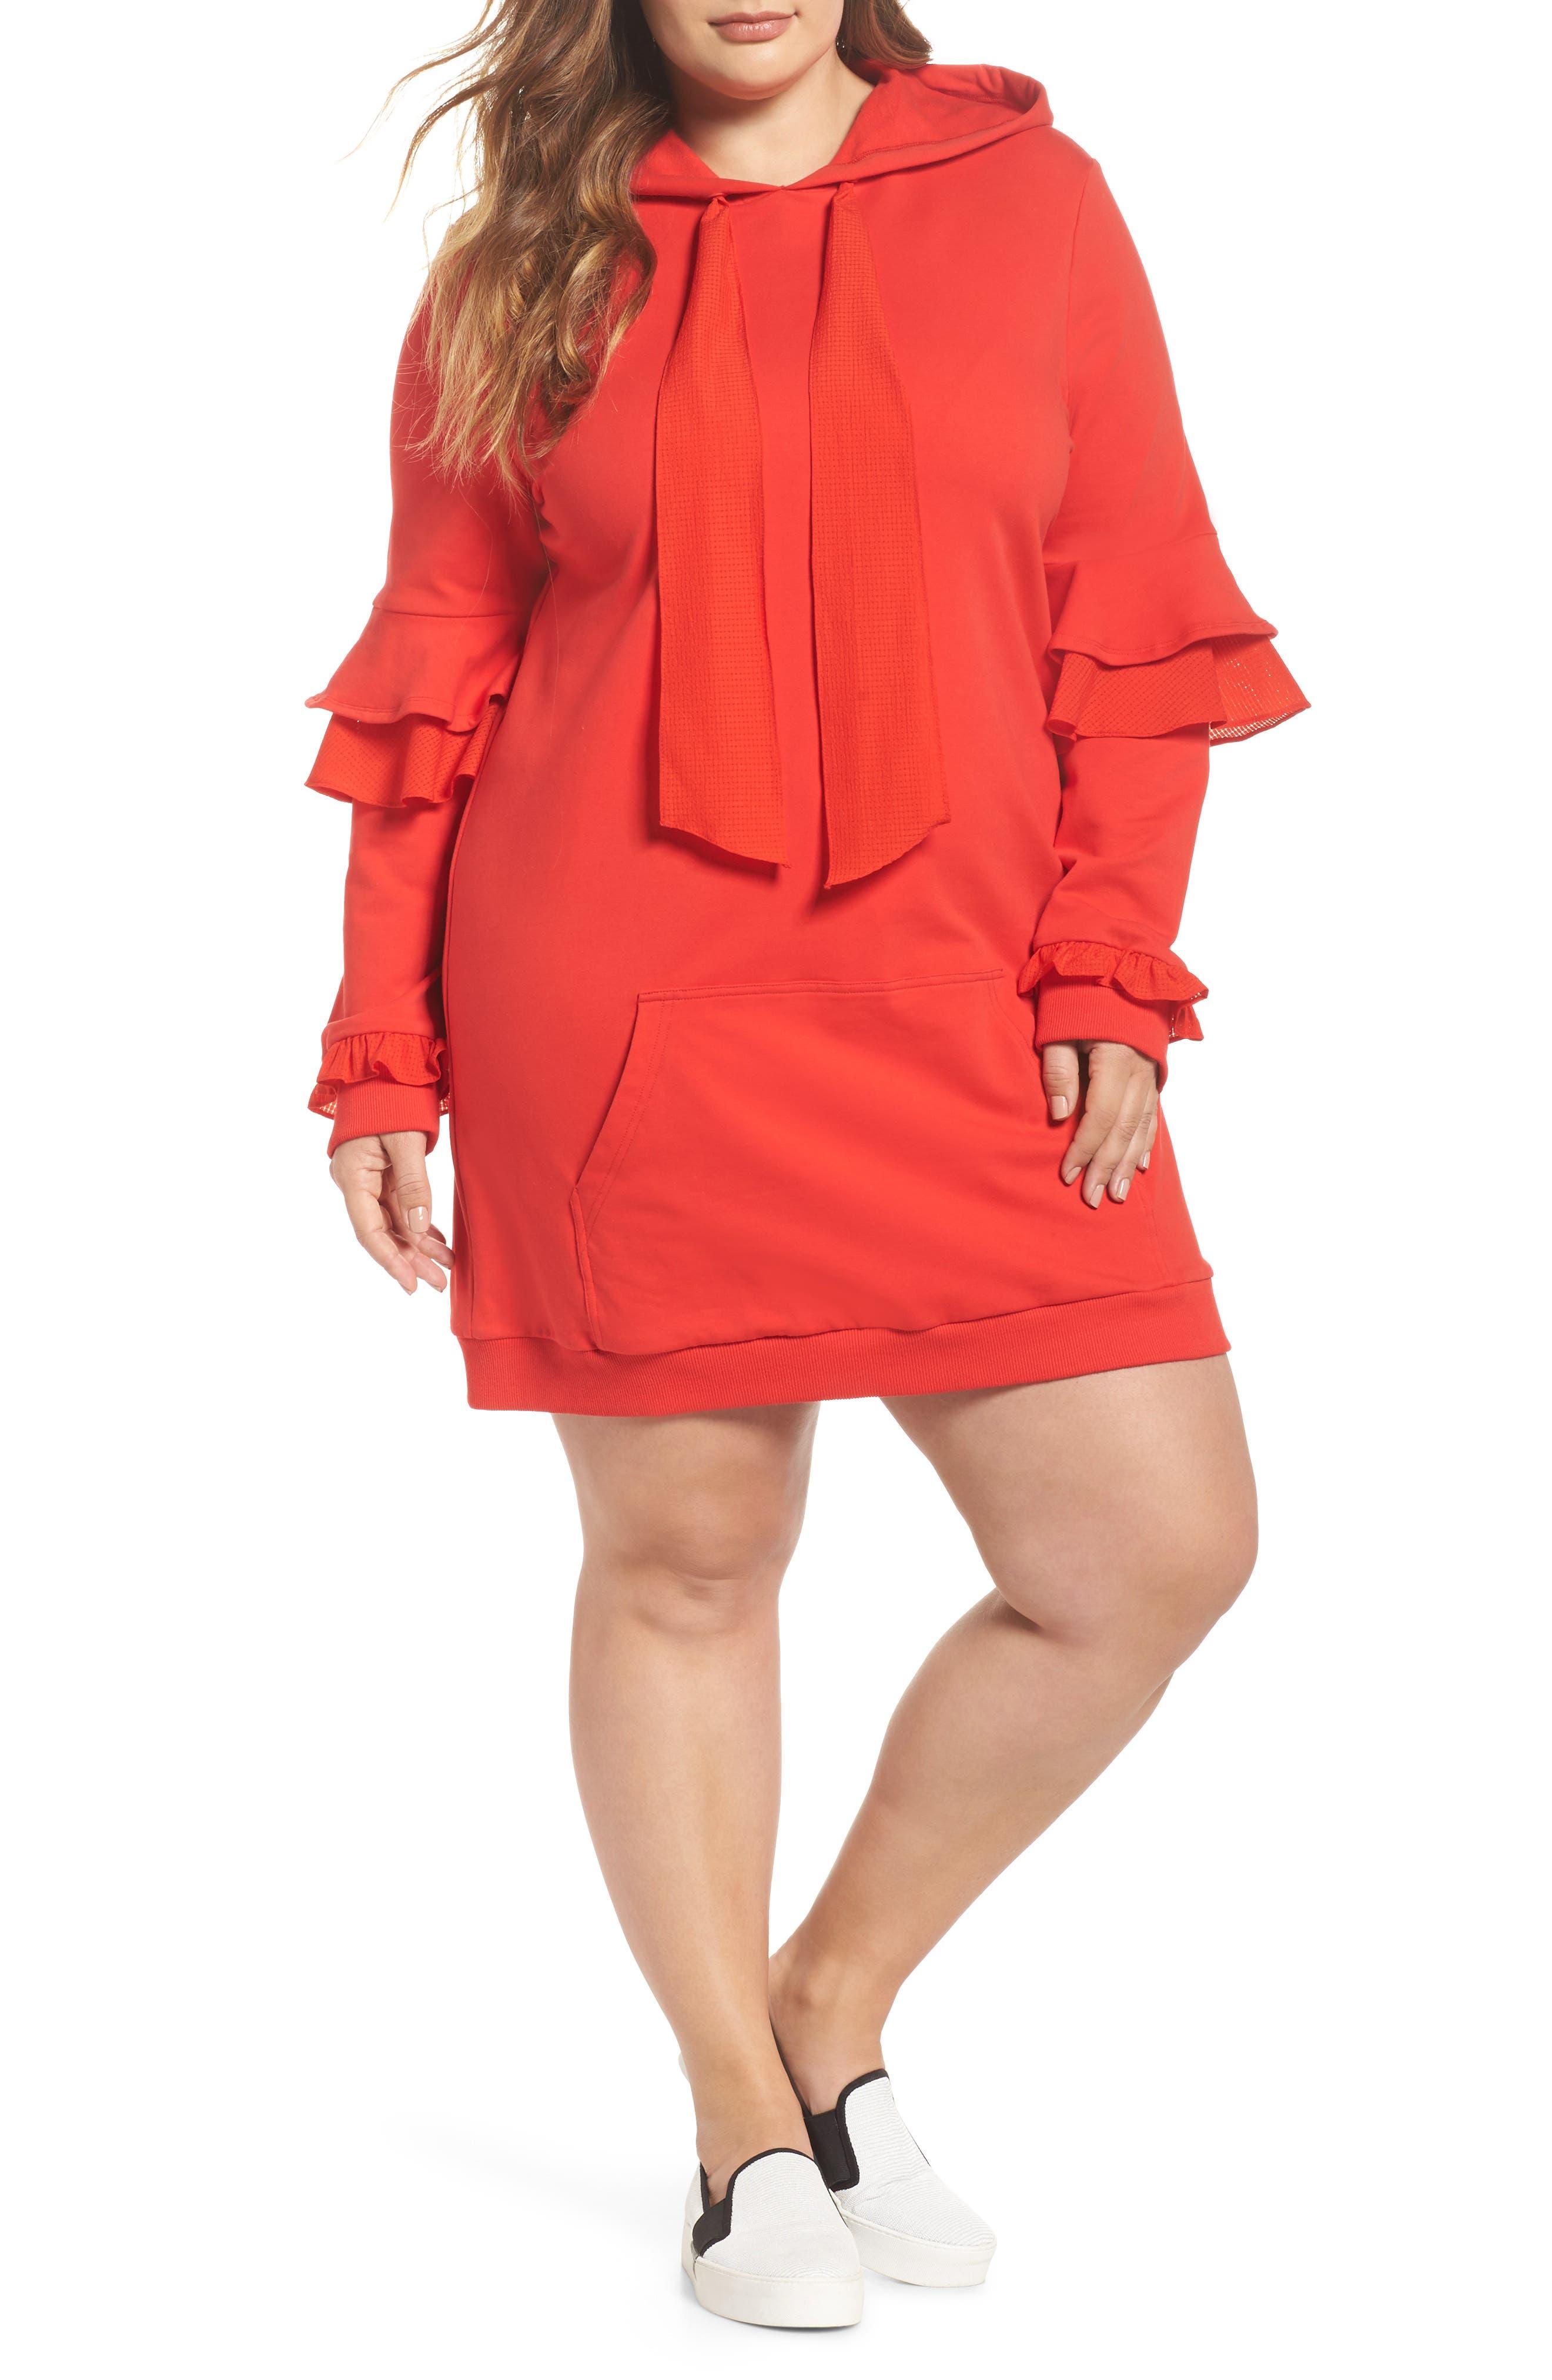 Alternate Image 1 Selected - ELVI The Snapdragon Ruffle Sleeve Hoodie Dress (Regular & Plus Size)